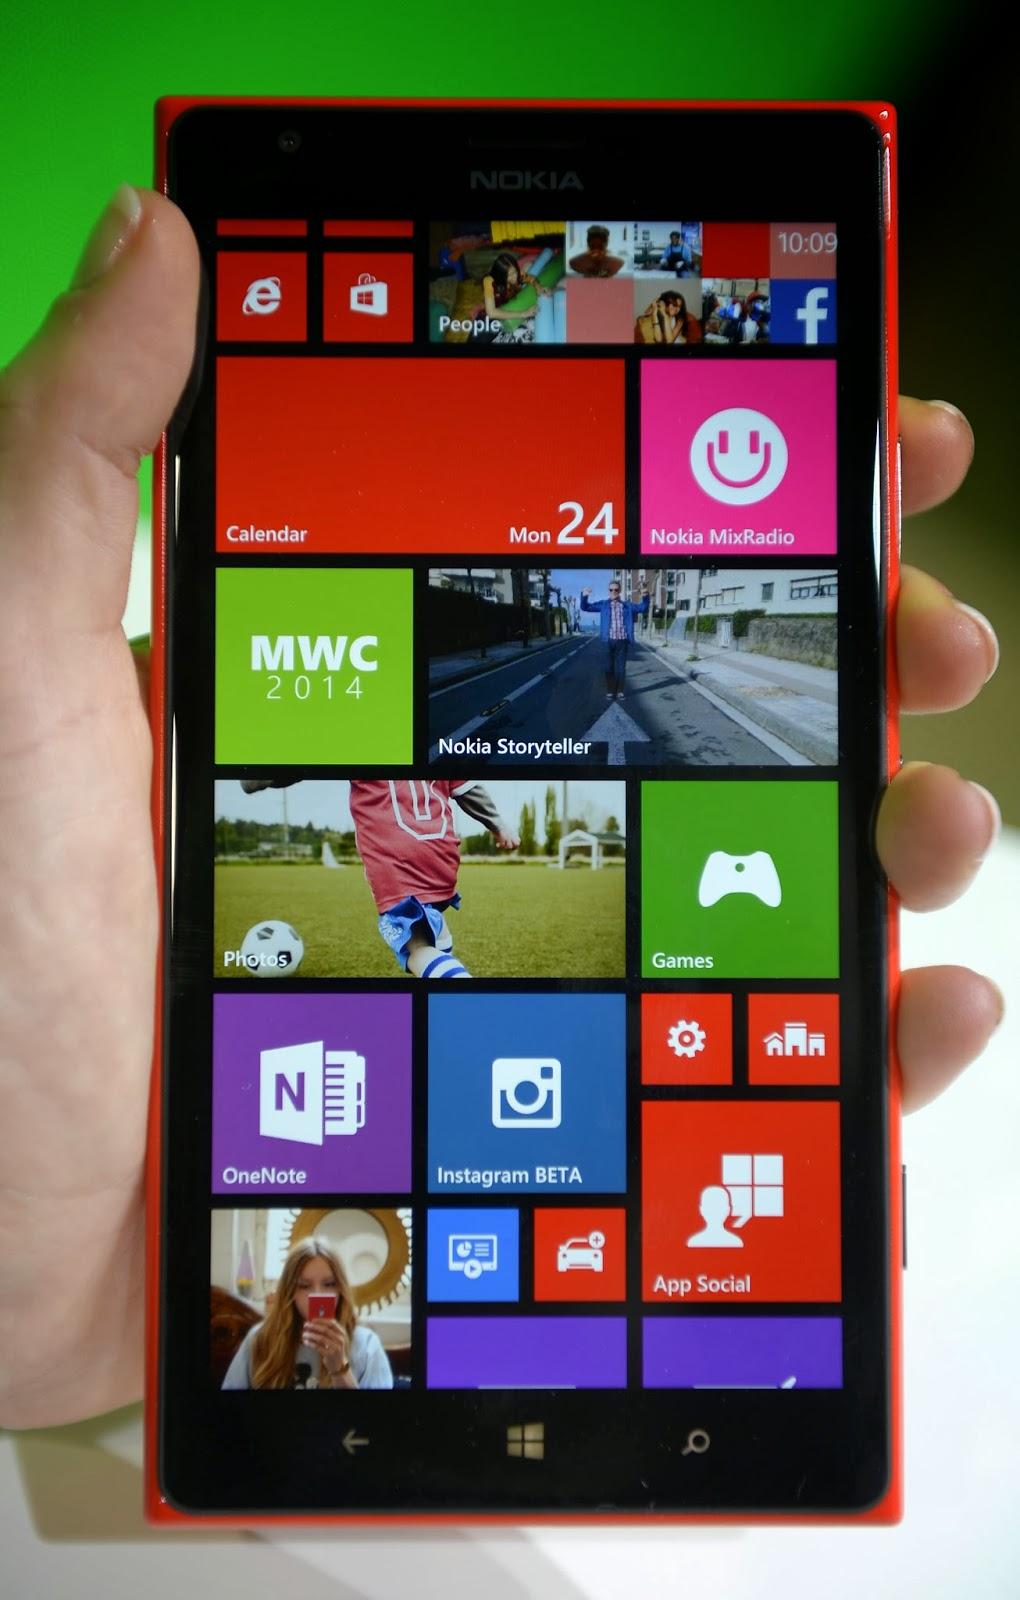 Nokia Lumia, Lumia 1520, Nokia, Pakistan, Technology, IT, Features, Accessories, Price in Pakistan, Smartphone, Mobile, News,